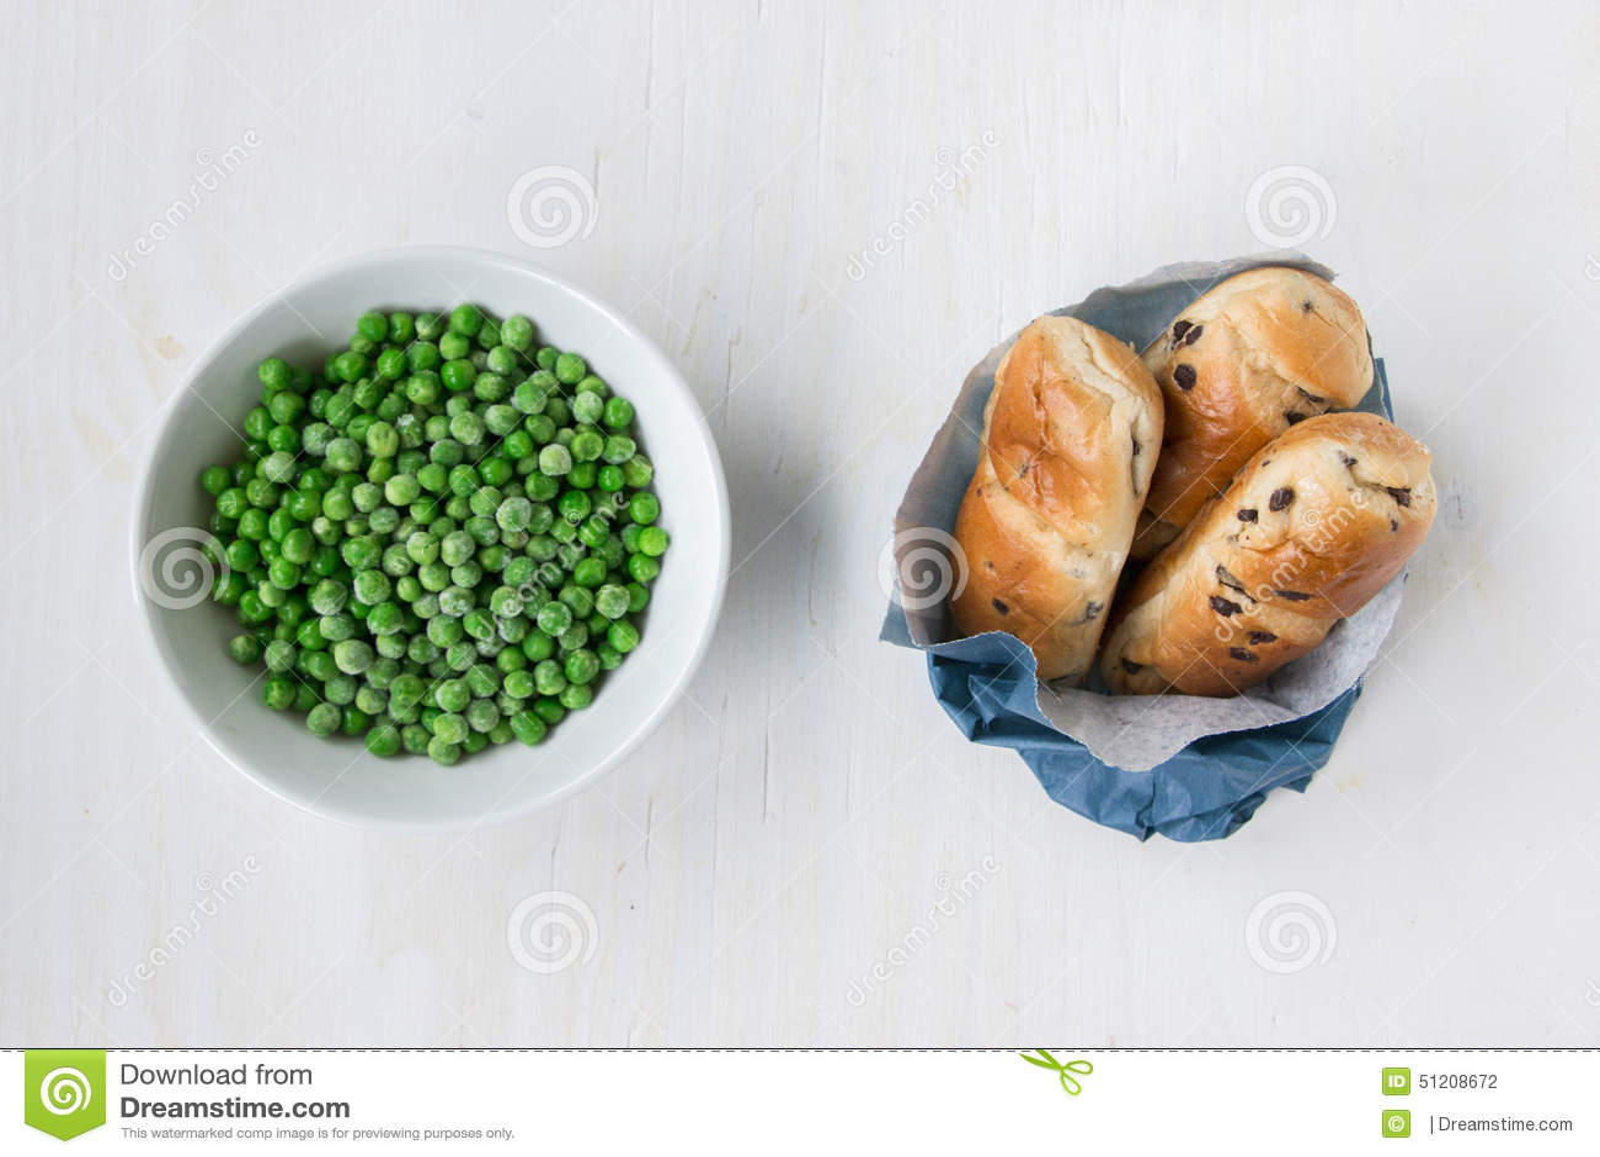 Opposé : malsain contre la nourriture saine